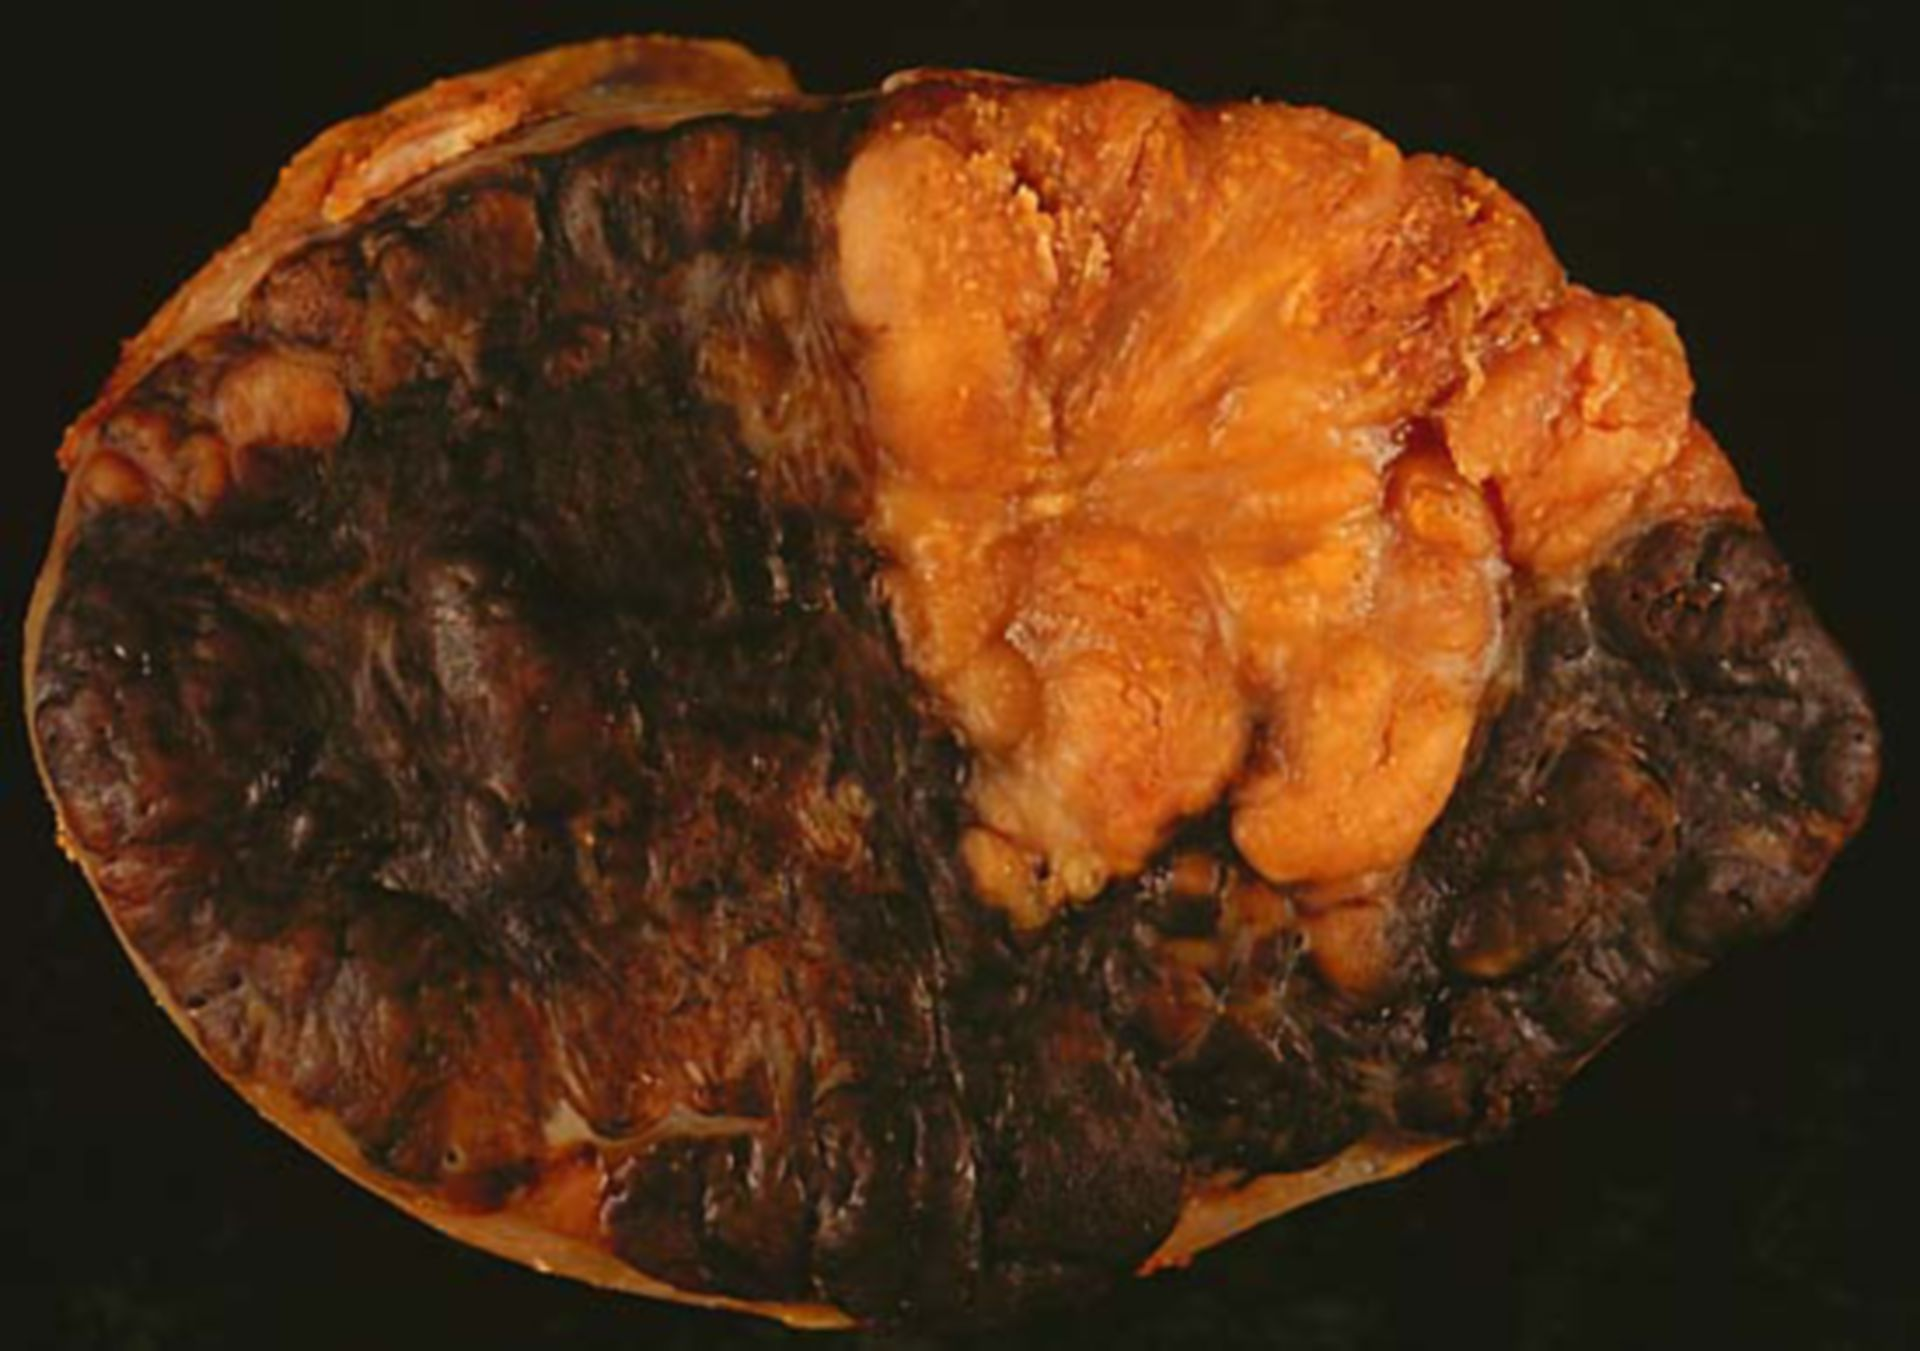 Lymphknoten-Metastase eines Melanoms (Präparat)